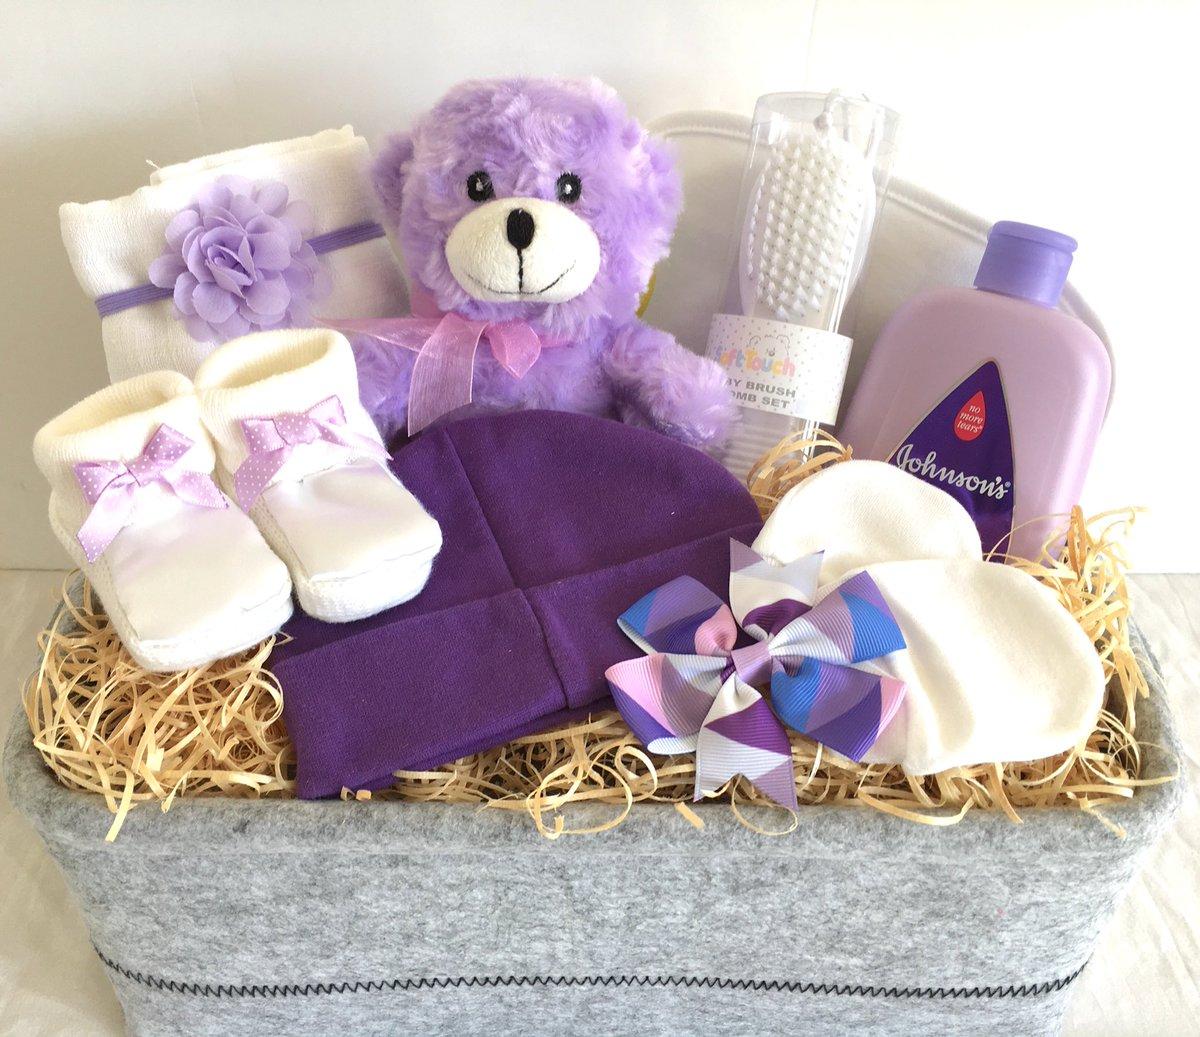 c188a4c20ecd Beautiful Baby Gift Baskets on Twitter: